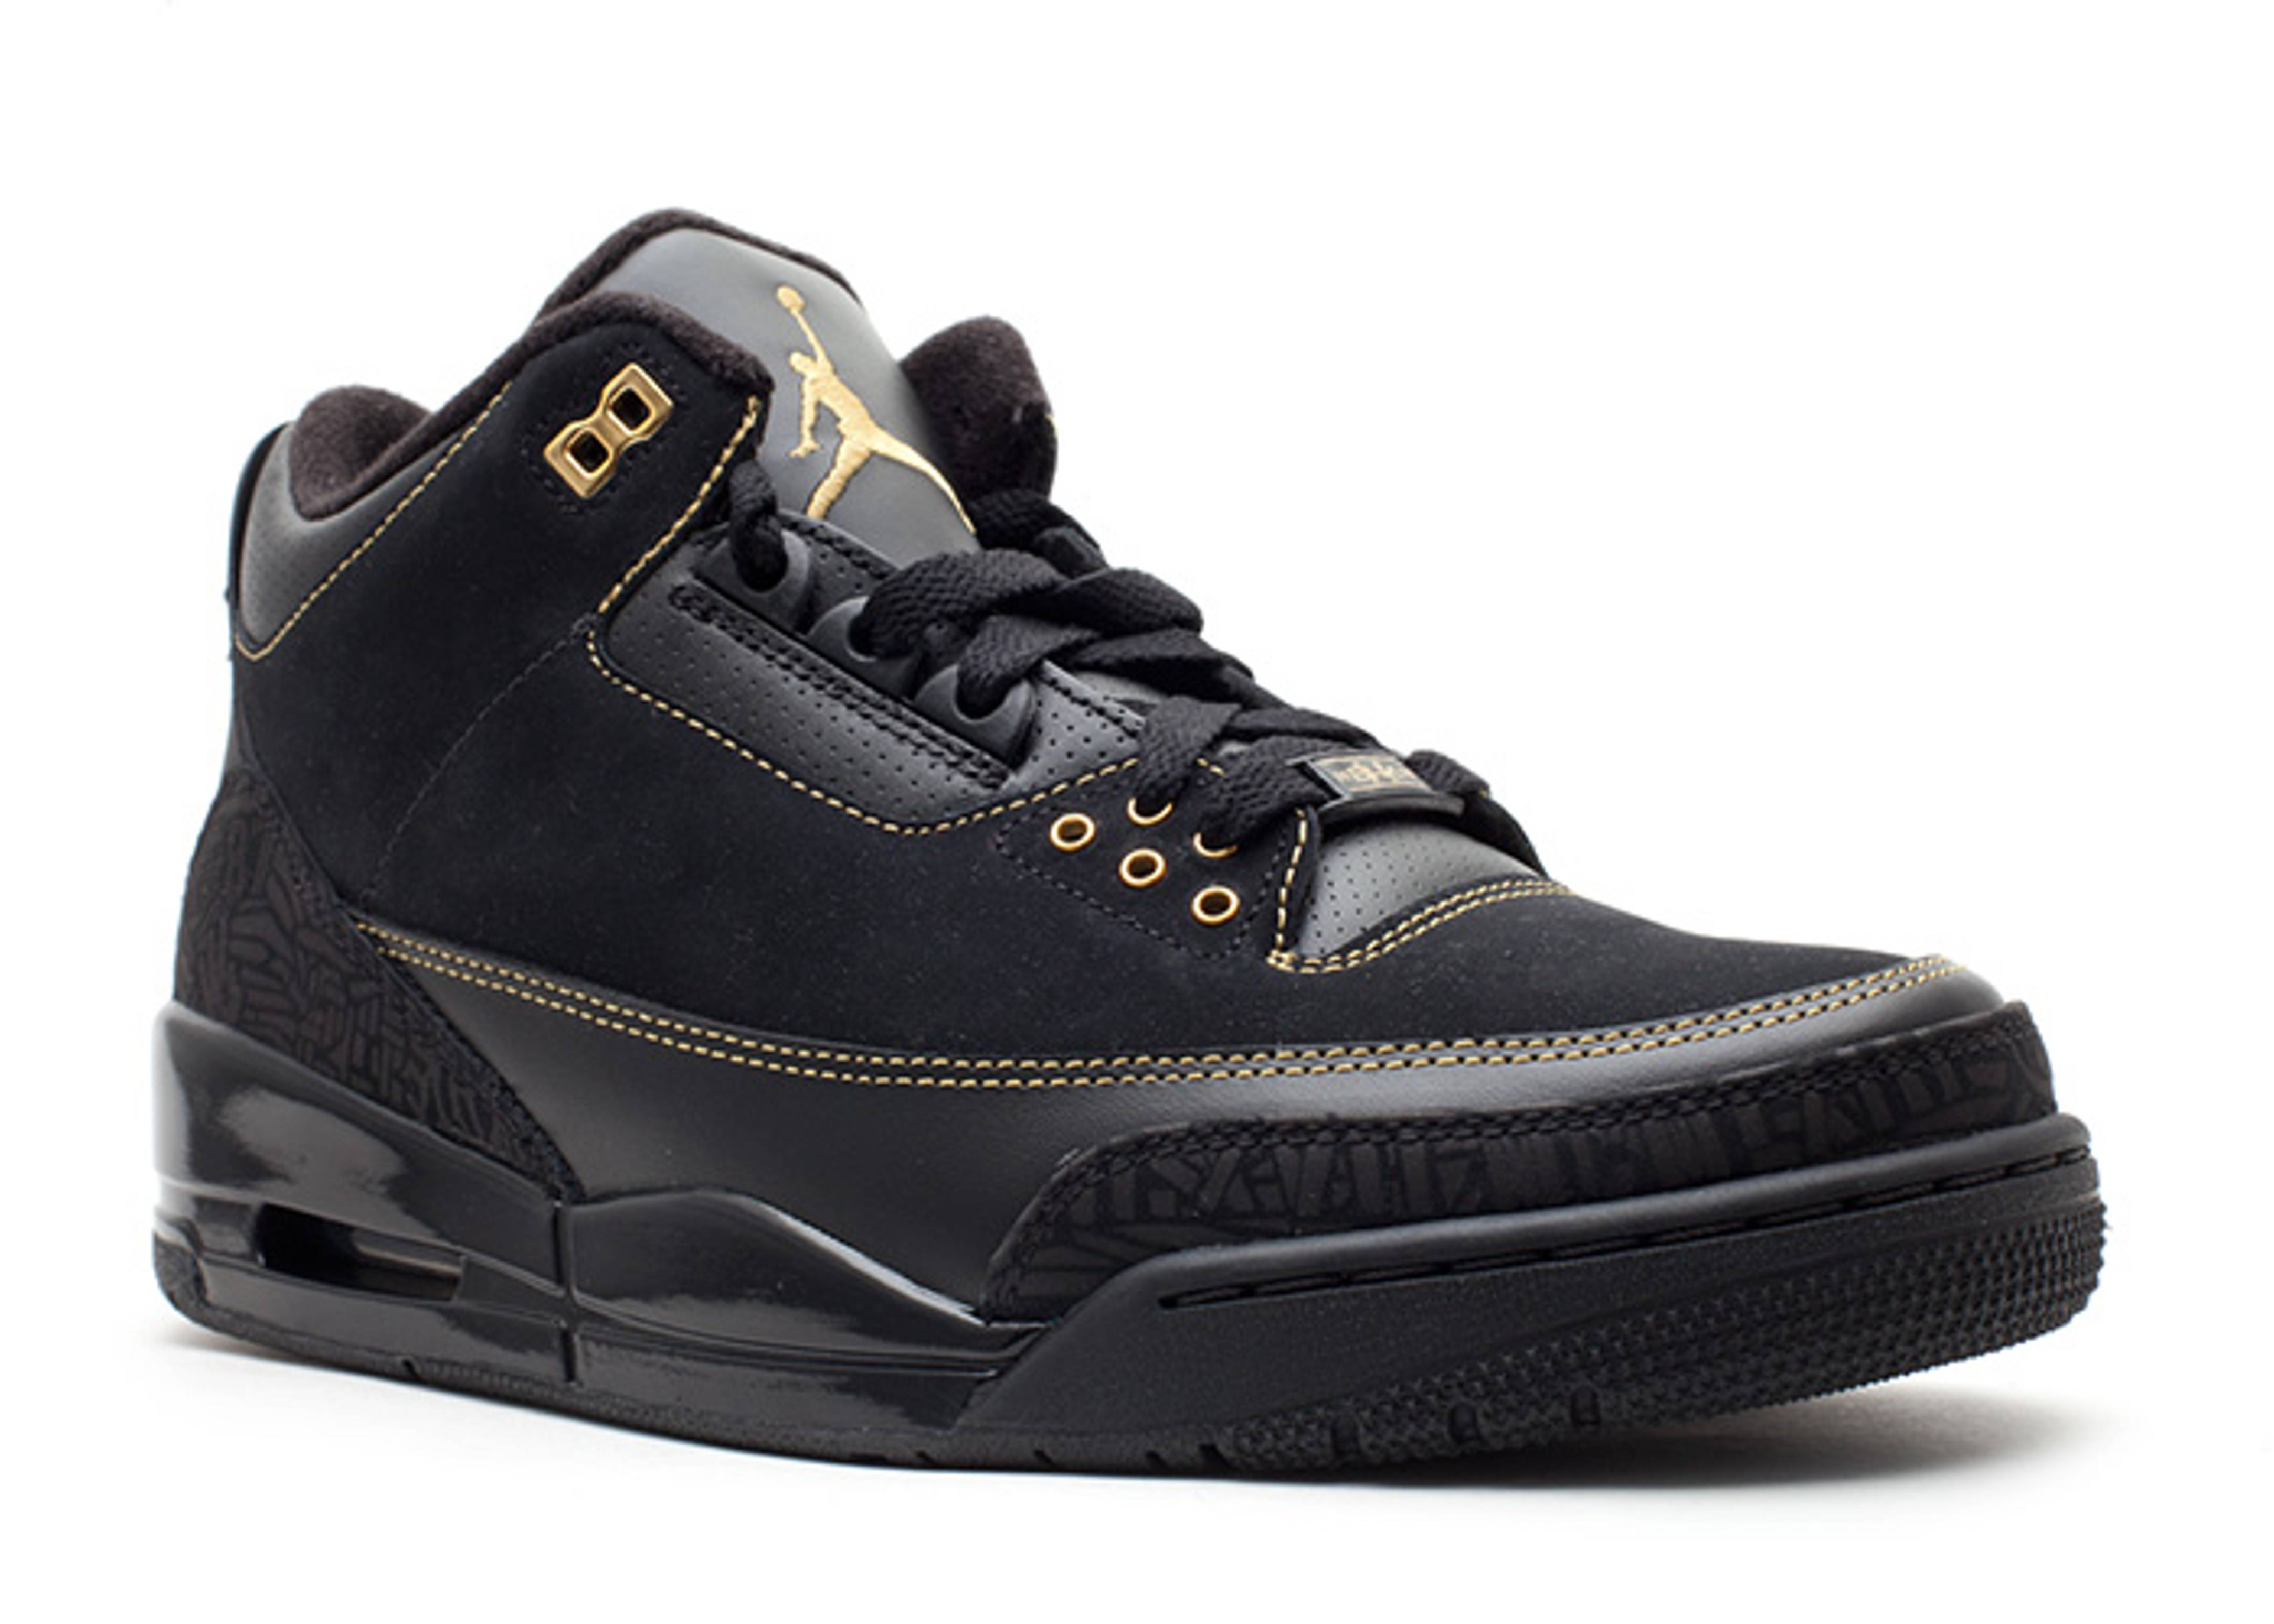 Air Jordan 3 Bhm